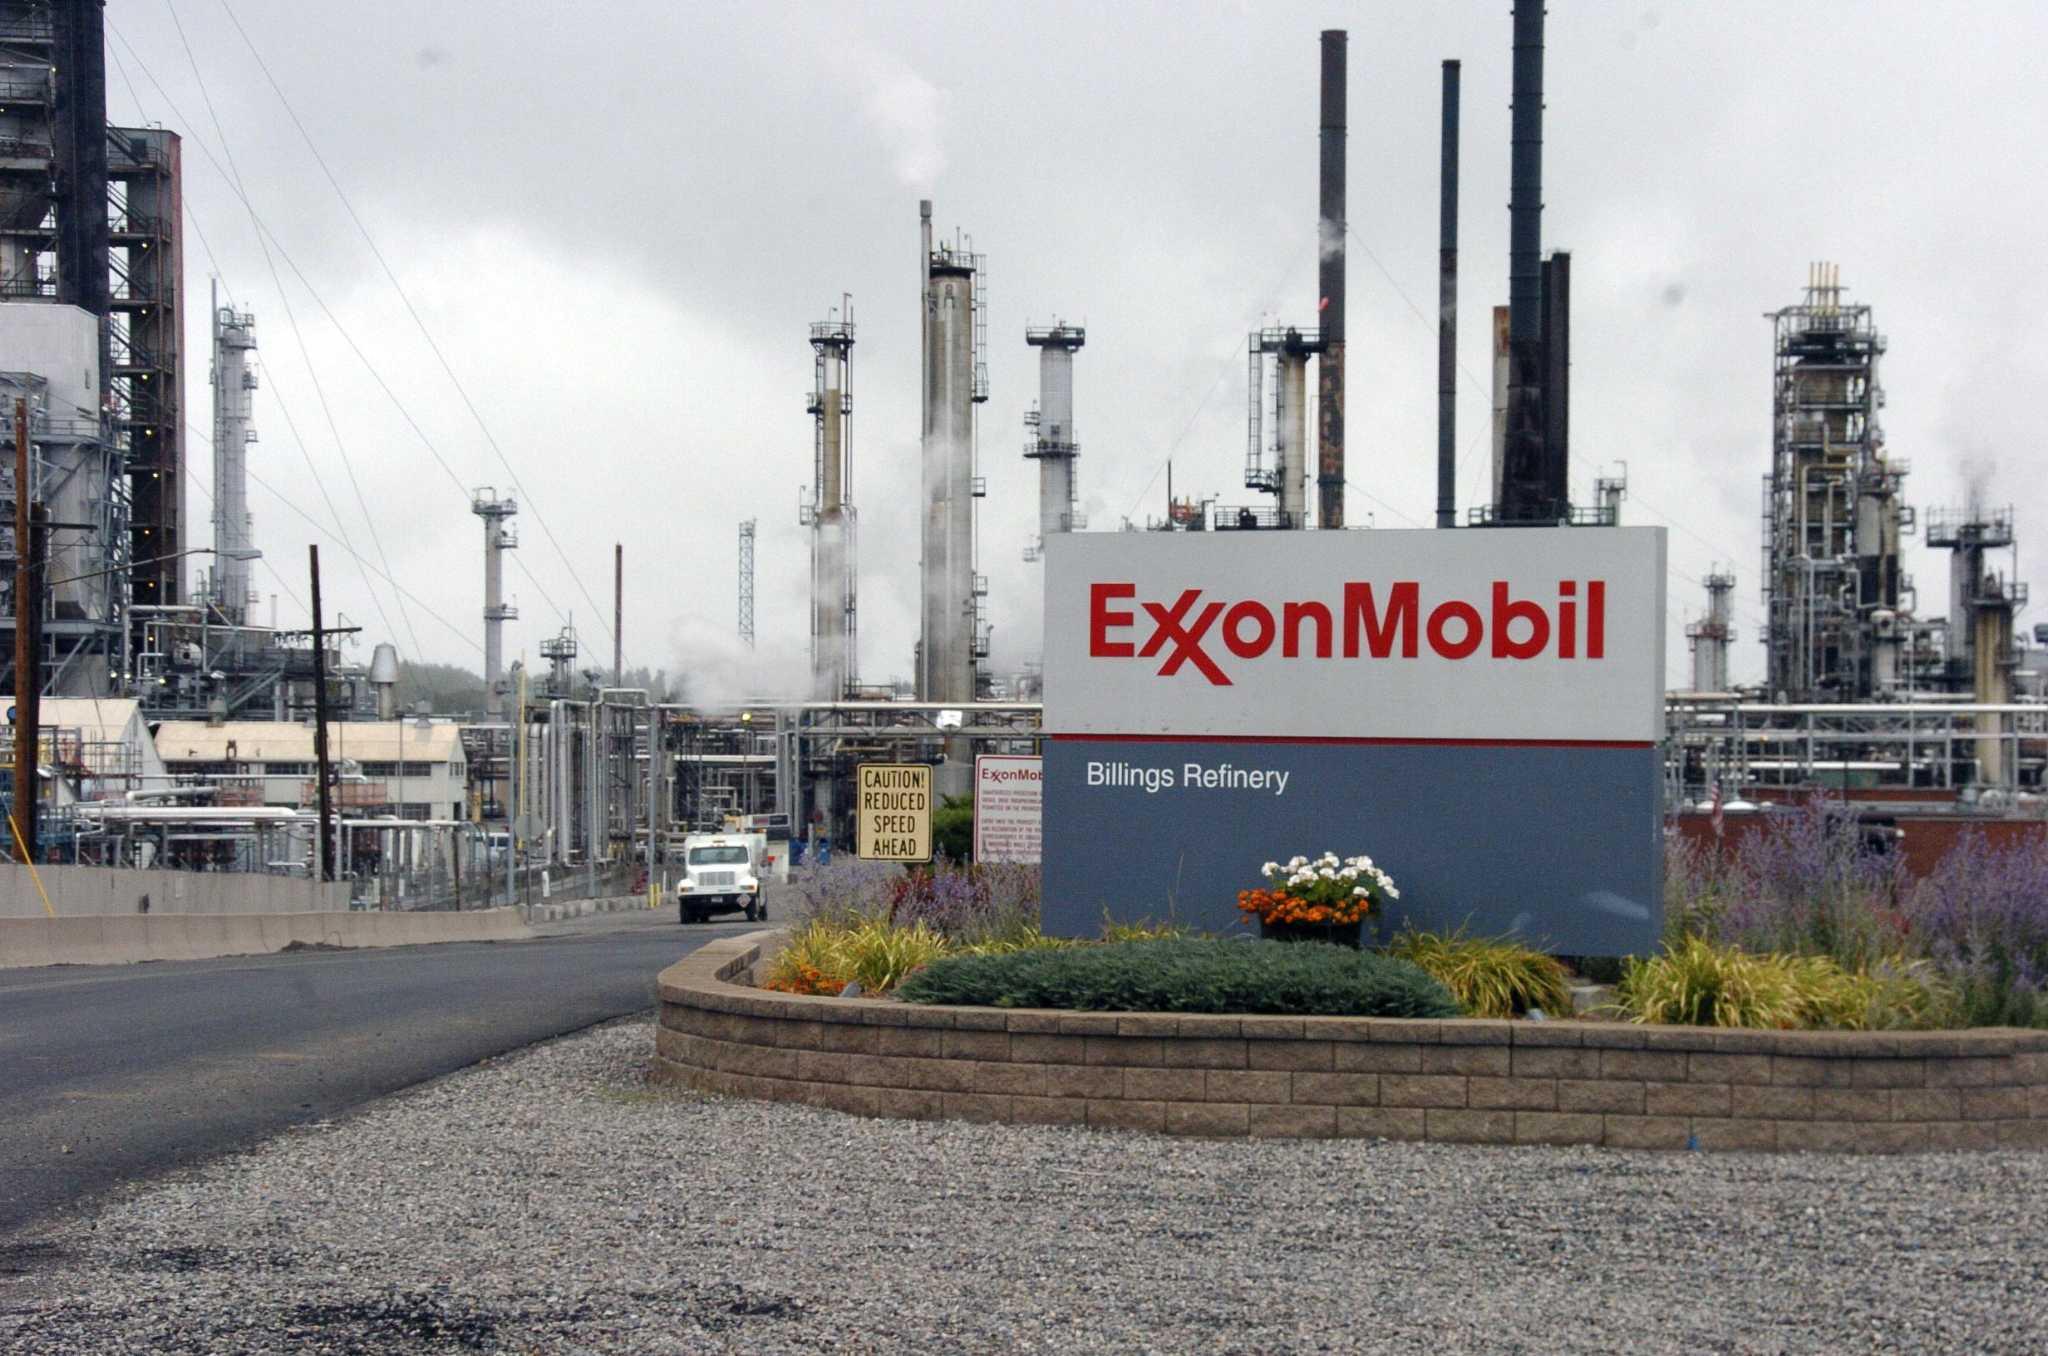 Chevron cutting jobs; Exxon has 'no layoff plans'